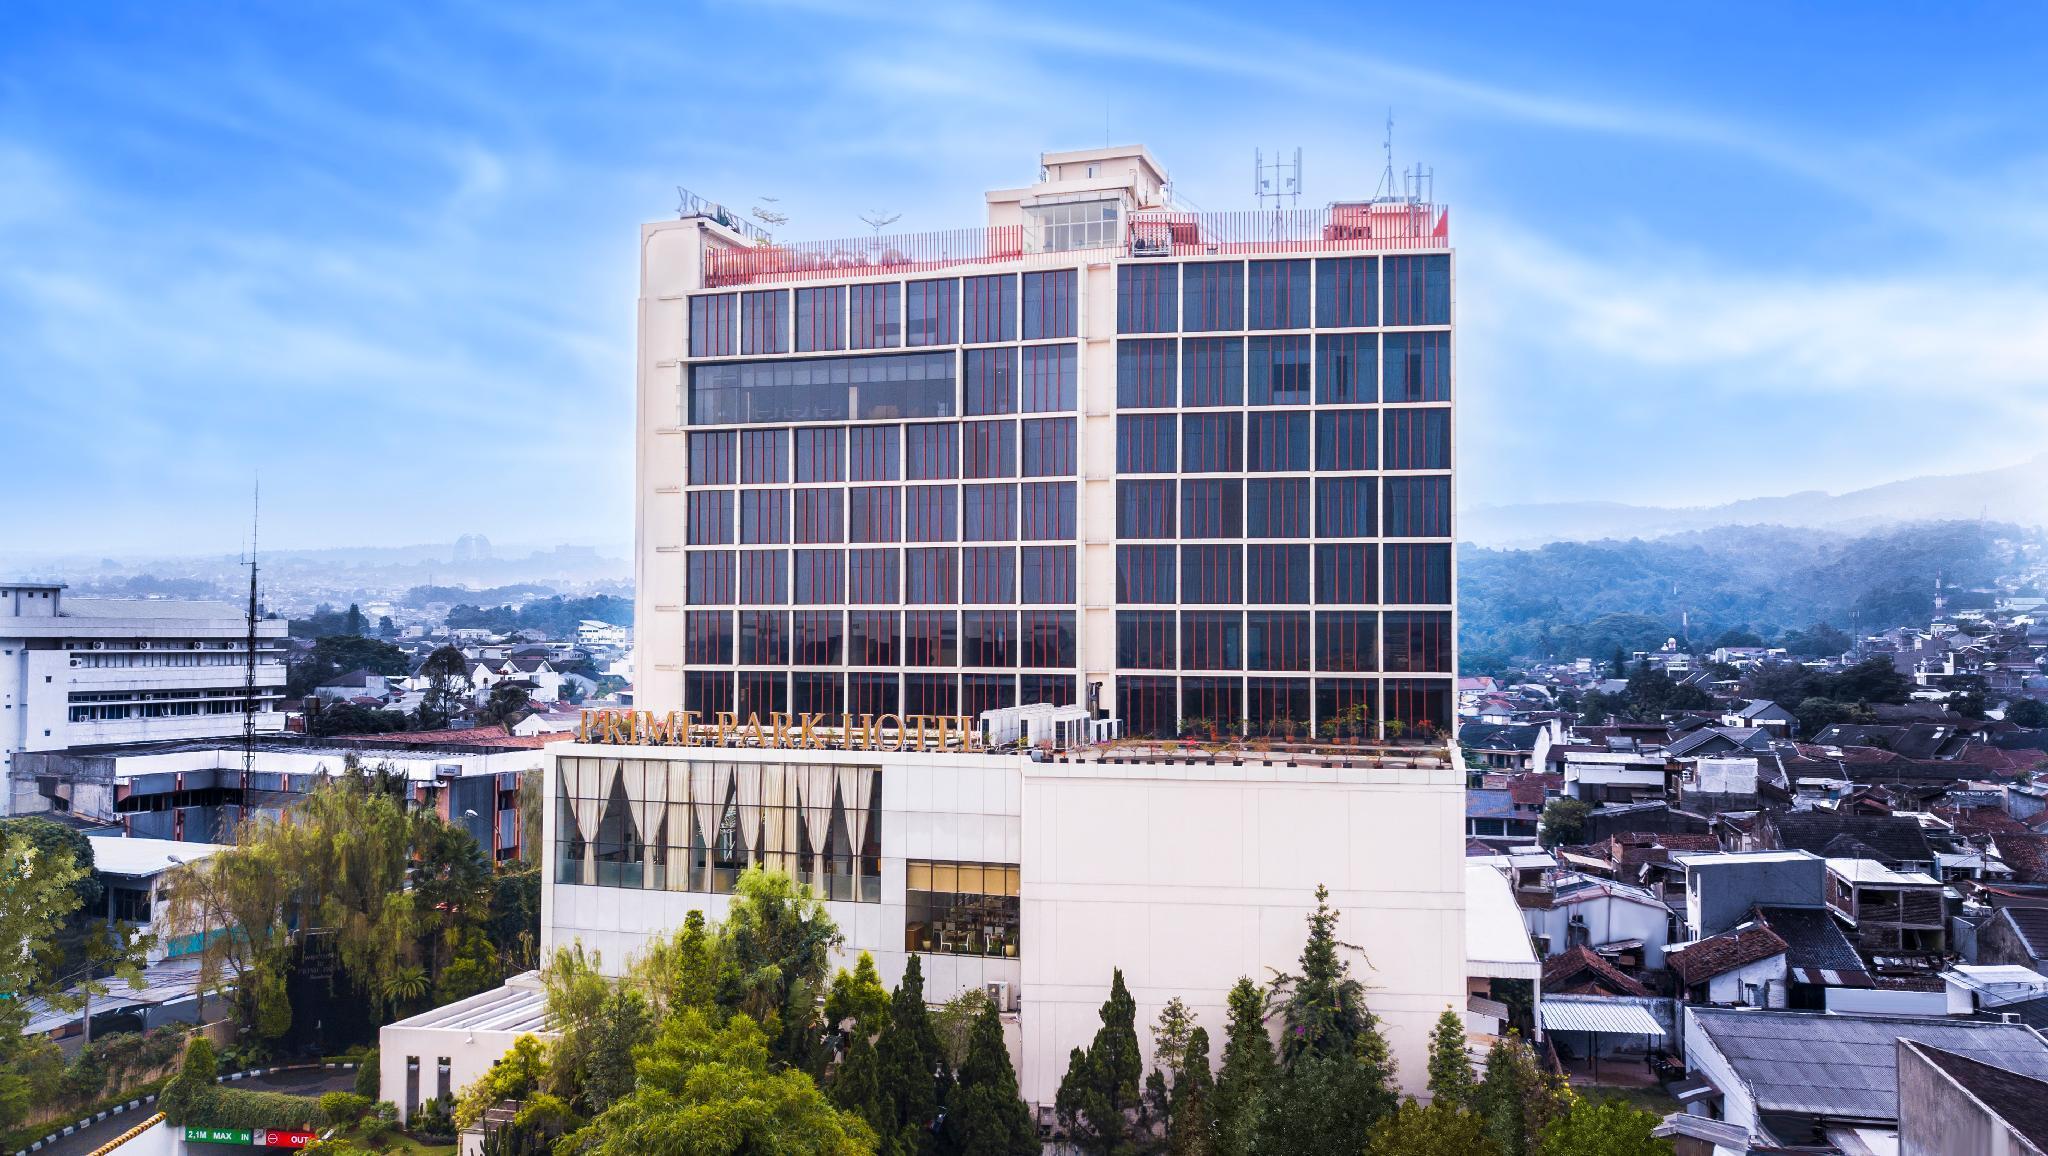 PRIME PARK Hotel Bandung, Indonesia | Da 18 €| Offerte Agoda